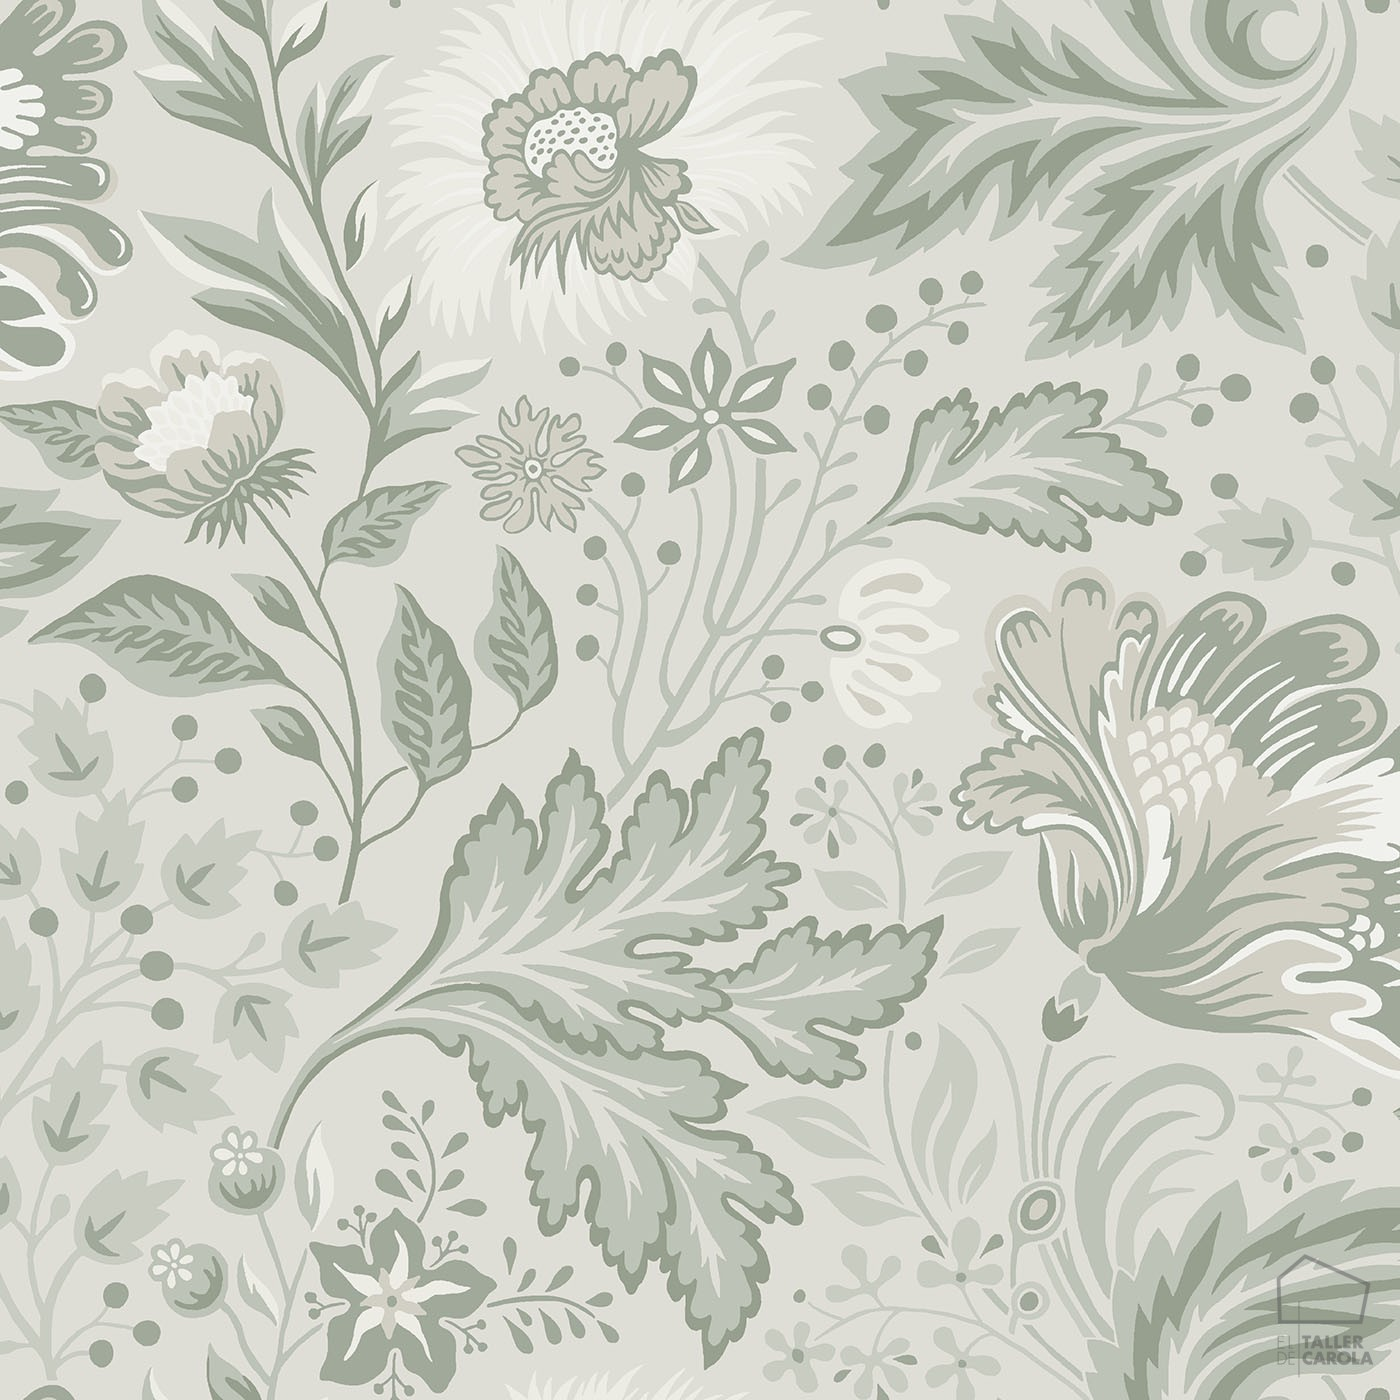 059fam2-ava-pis400-48-papel-pintado-flores-grandes-verde-pistacho-1